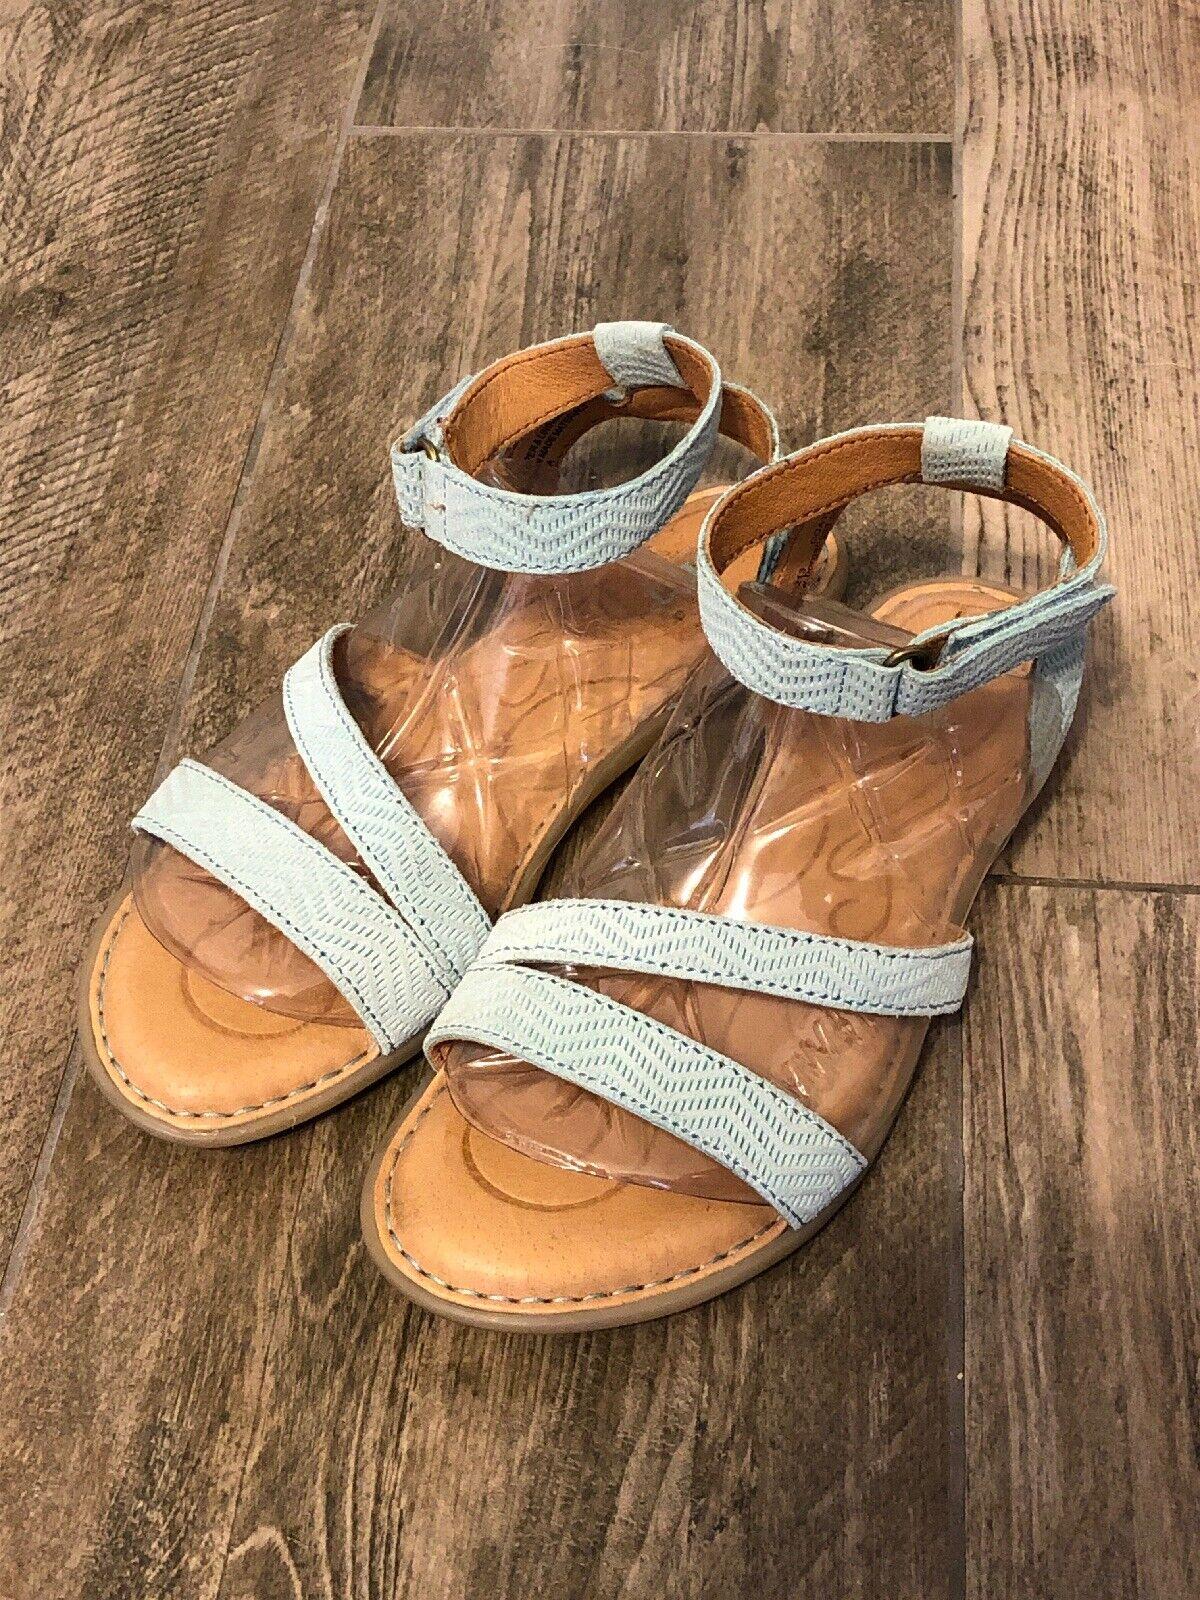 Born August Sandal shoes Aqua Green bluee Cyan Leather F20213 Womens US 6 Med